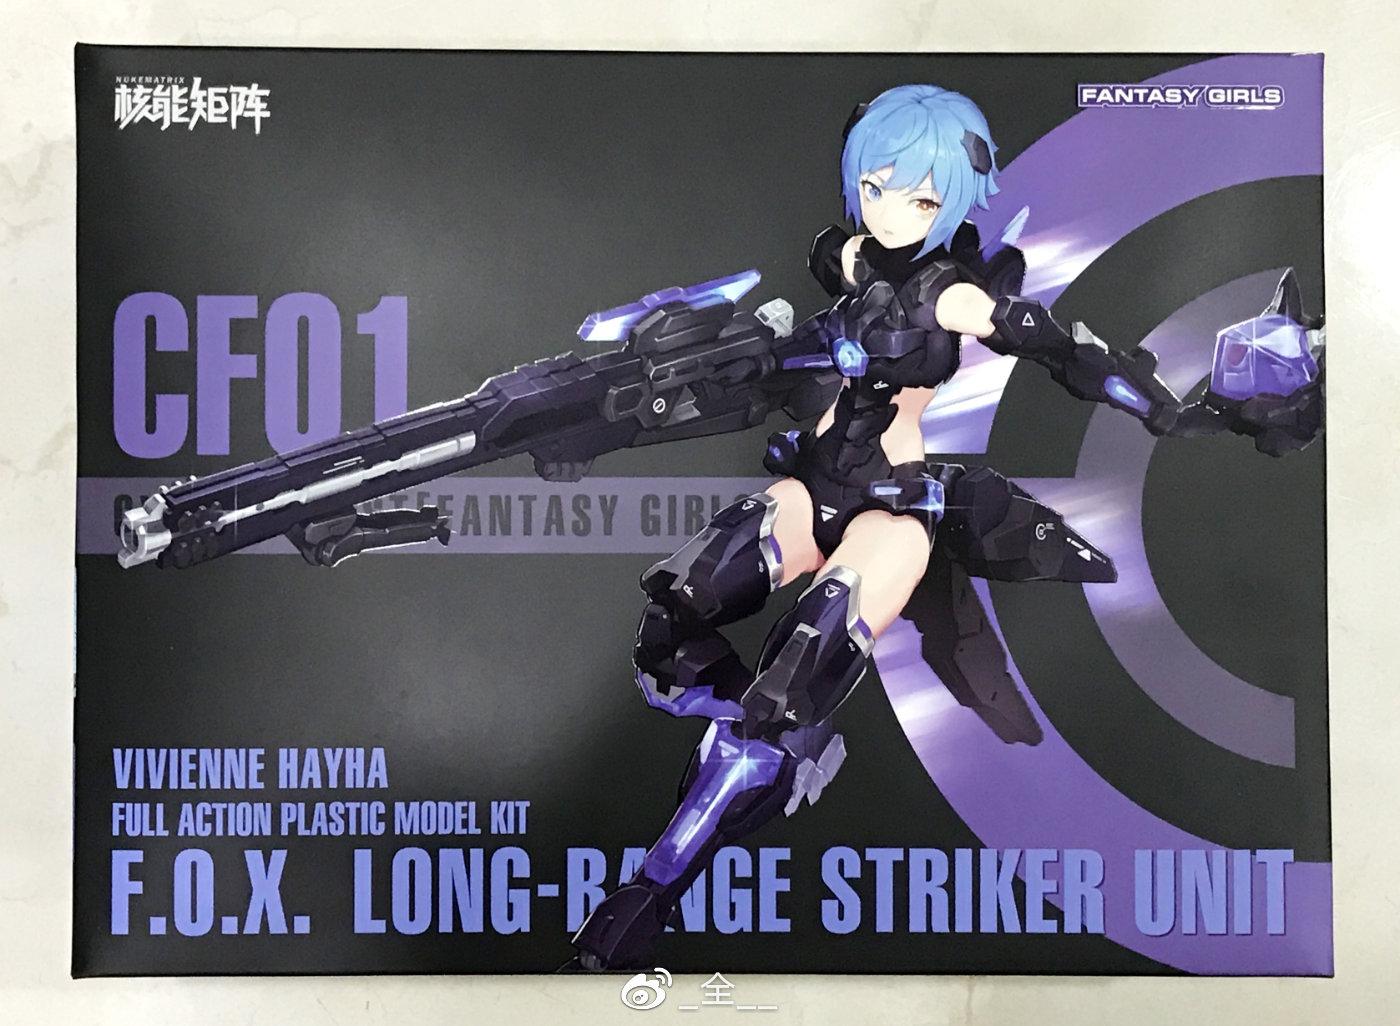 S550_NUKE_MATRIX_CYBER_FOREST_FANTASY_GIRLS_FOXLONG_RANGE_STRIKER_UNIT_002.jpg